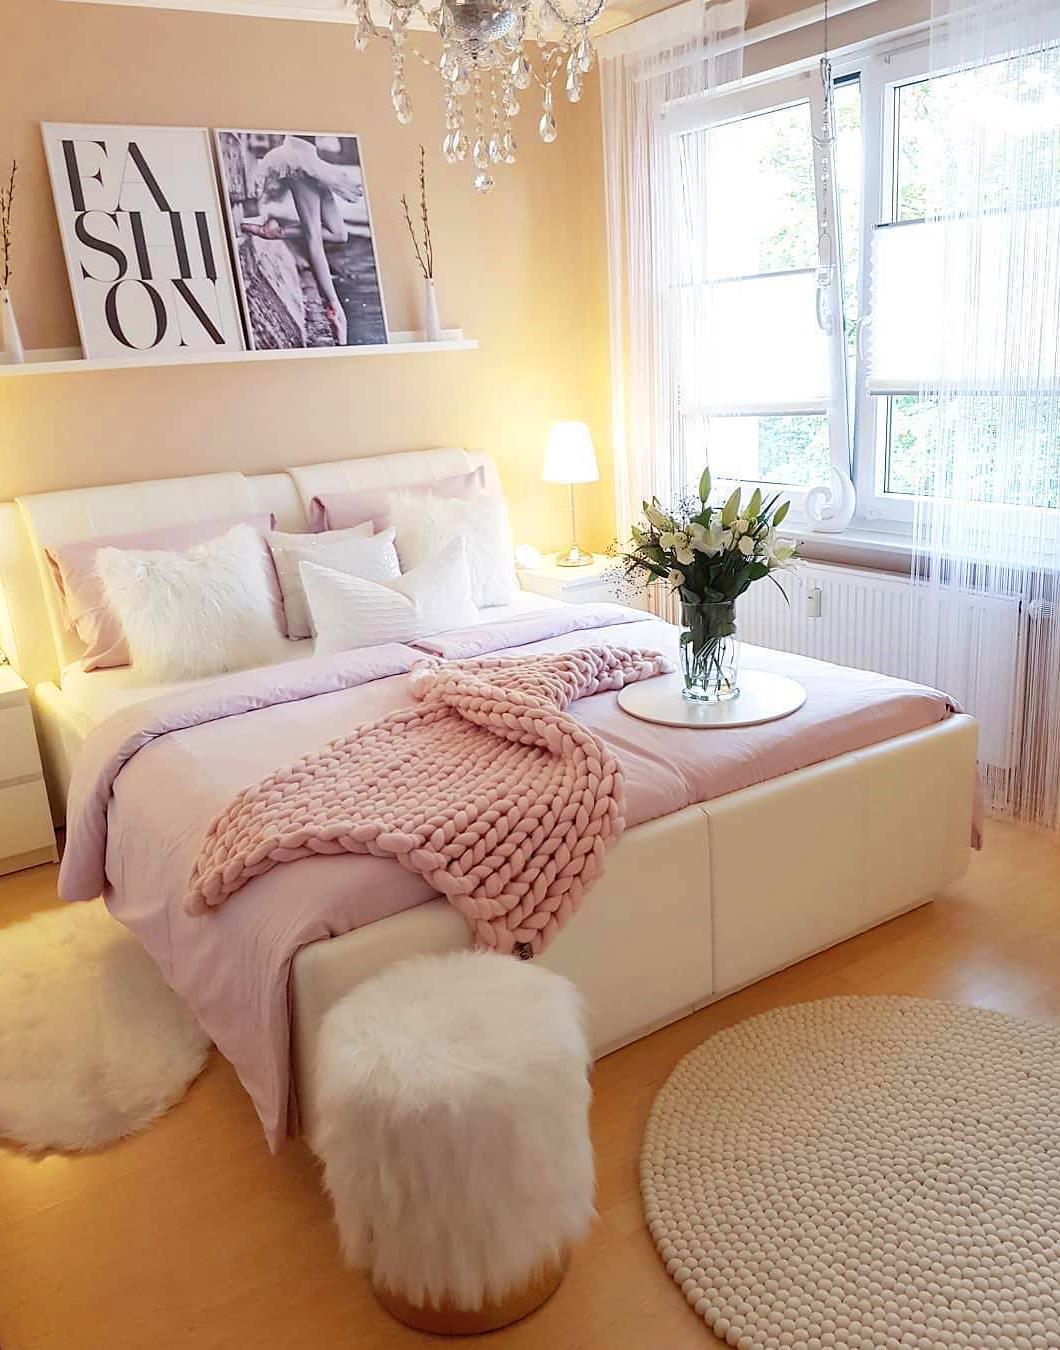 60 Creative Master Bedroom Design Ideas #bedroom #masterbedroom #sittingarea #homedecor #interiordesign #decorhomeideas